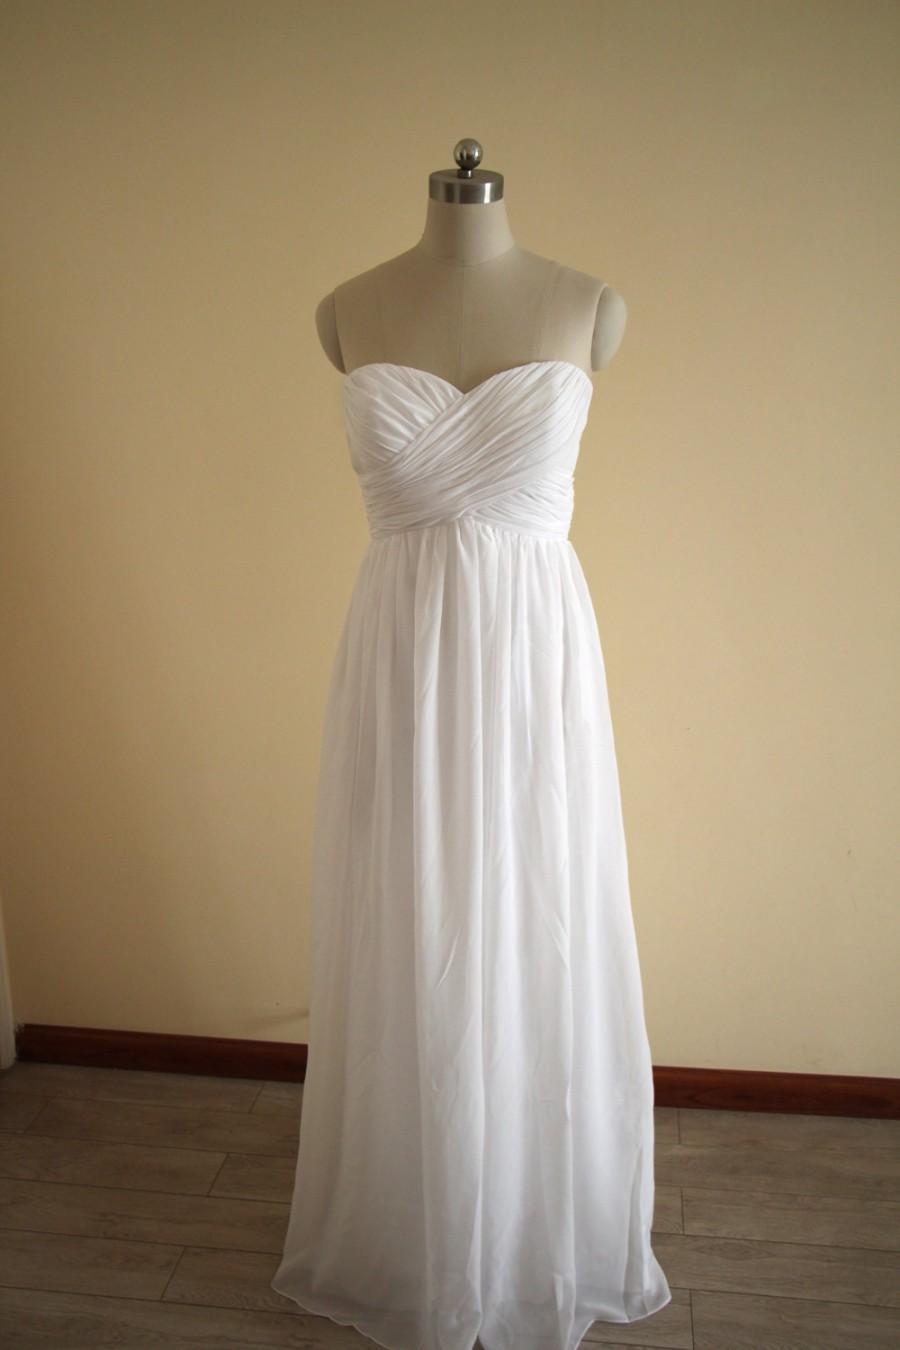 Hochzeit - White Long Sweetheart Bridesmaid Dress Floor Length White Chiffon Strapless Bridesmaid Dress